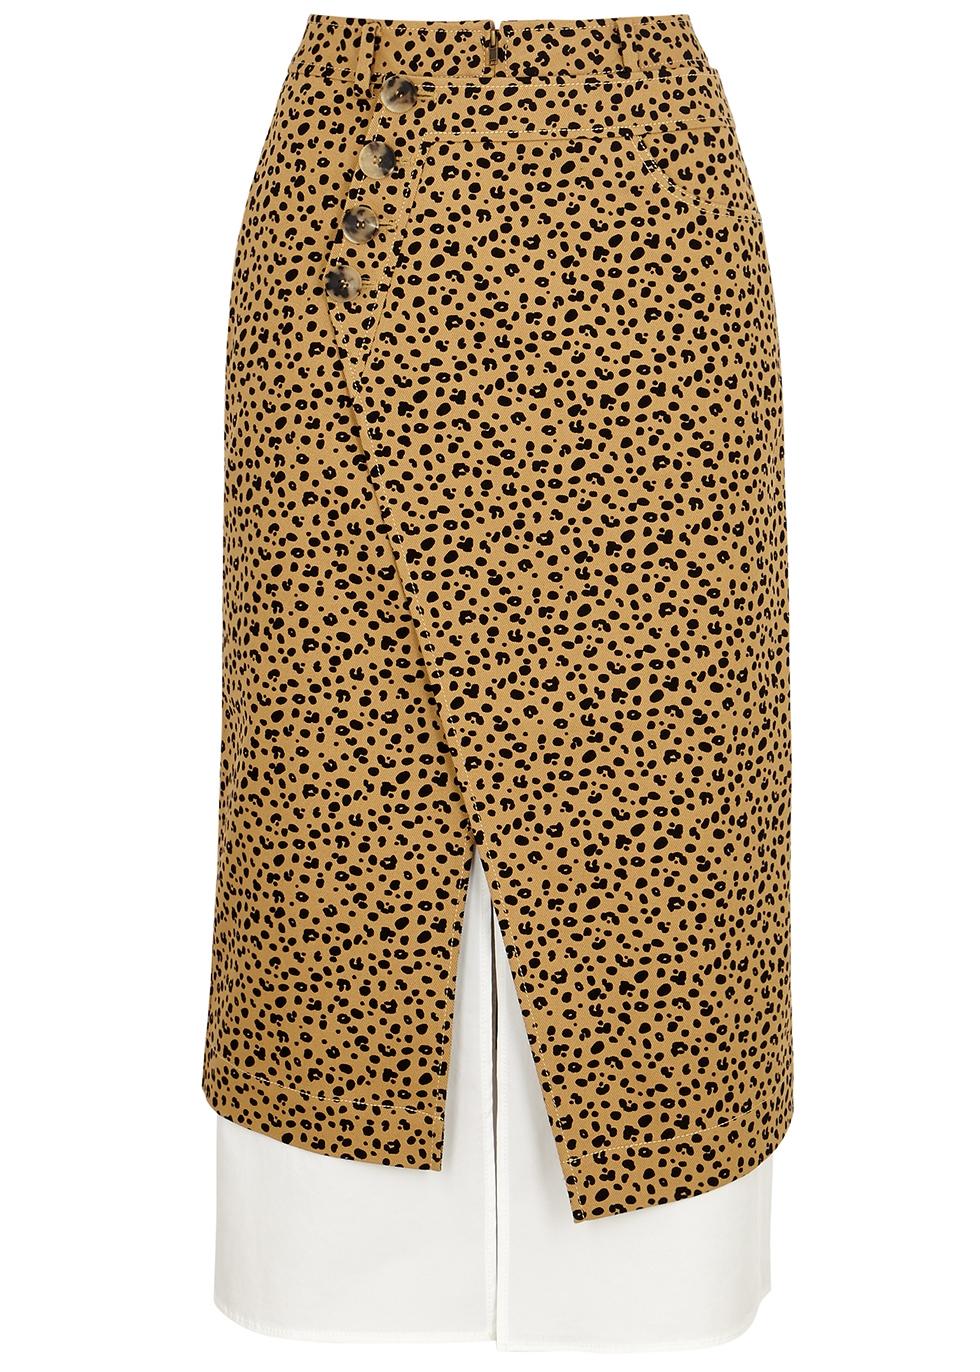 Steffi leopard-print denim wrap skirt - Rejina Pyo